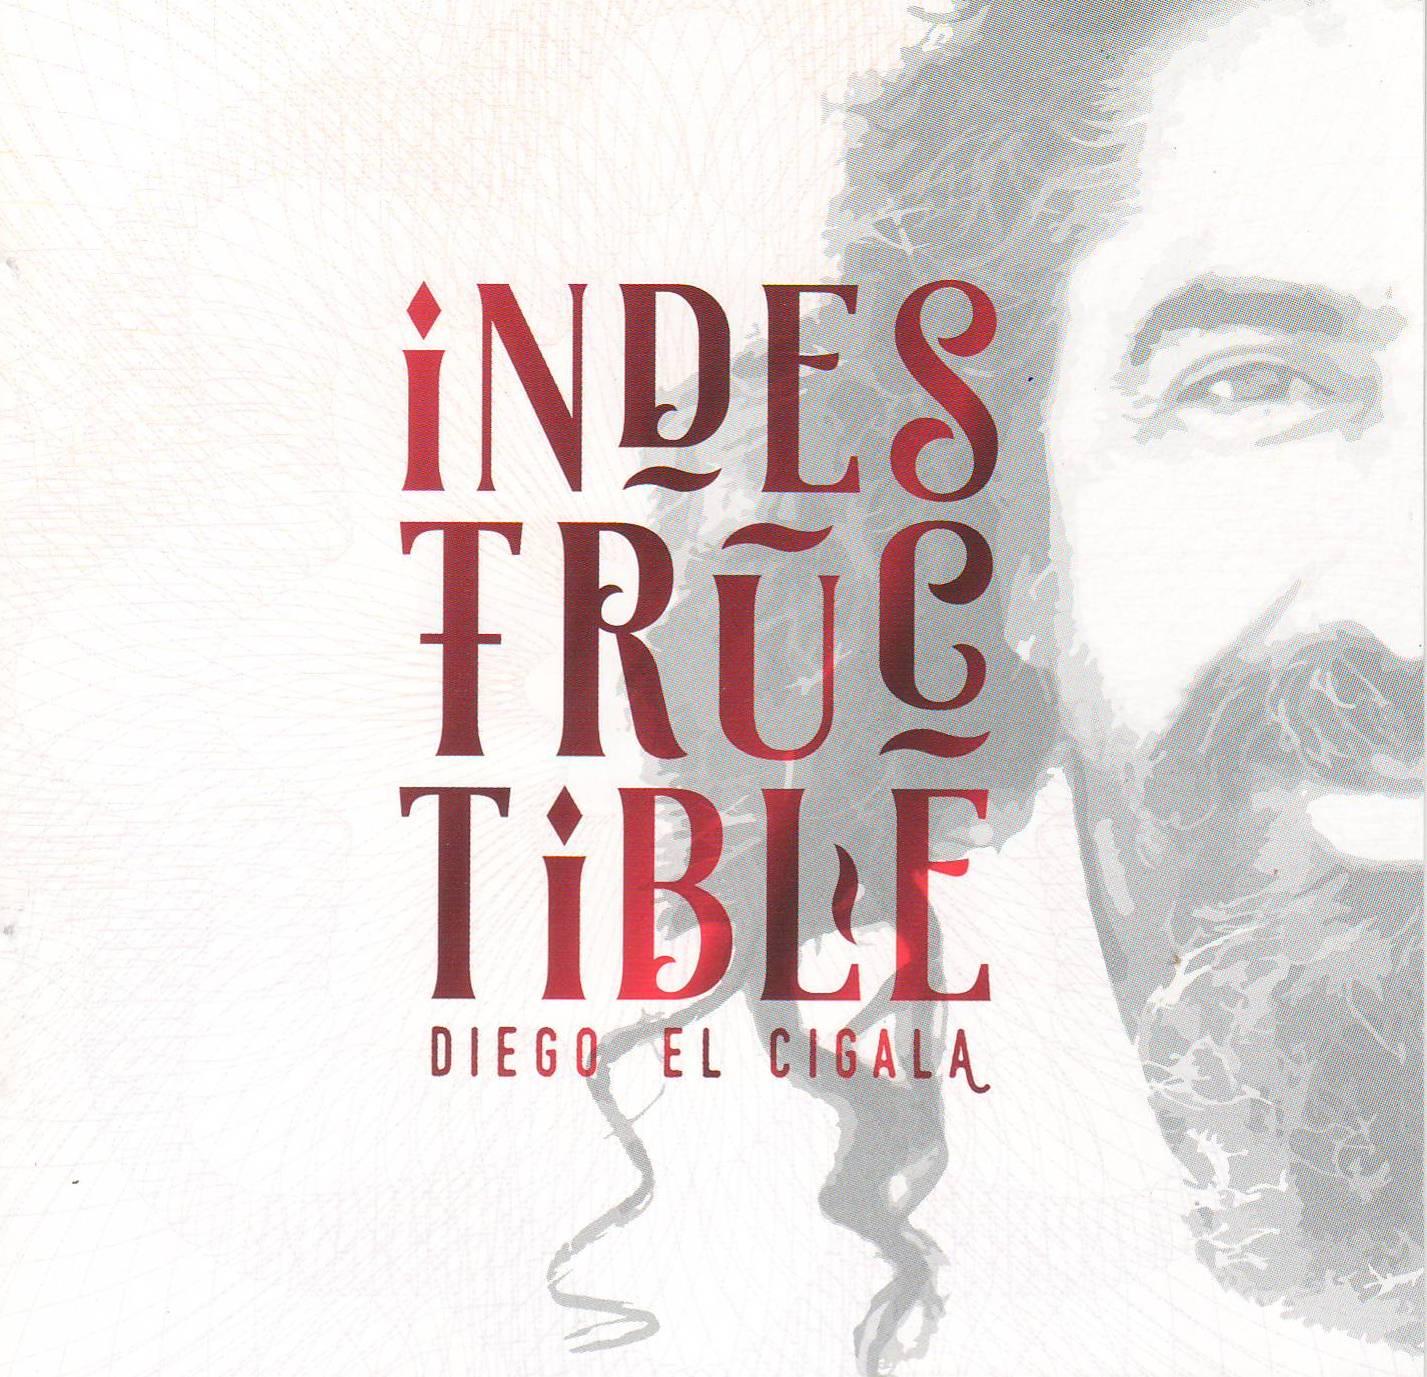 diego-de-cigala-2016-indestructible